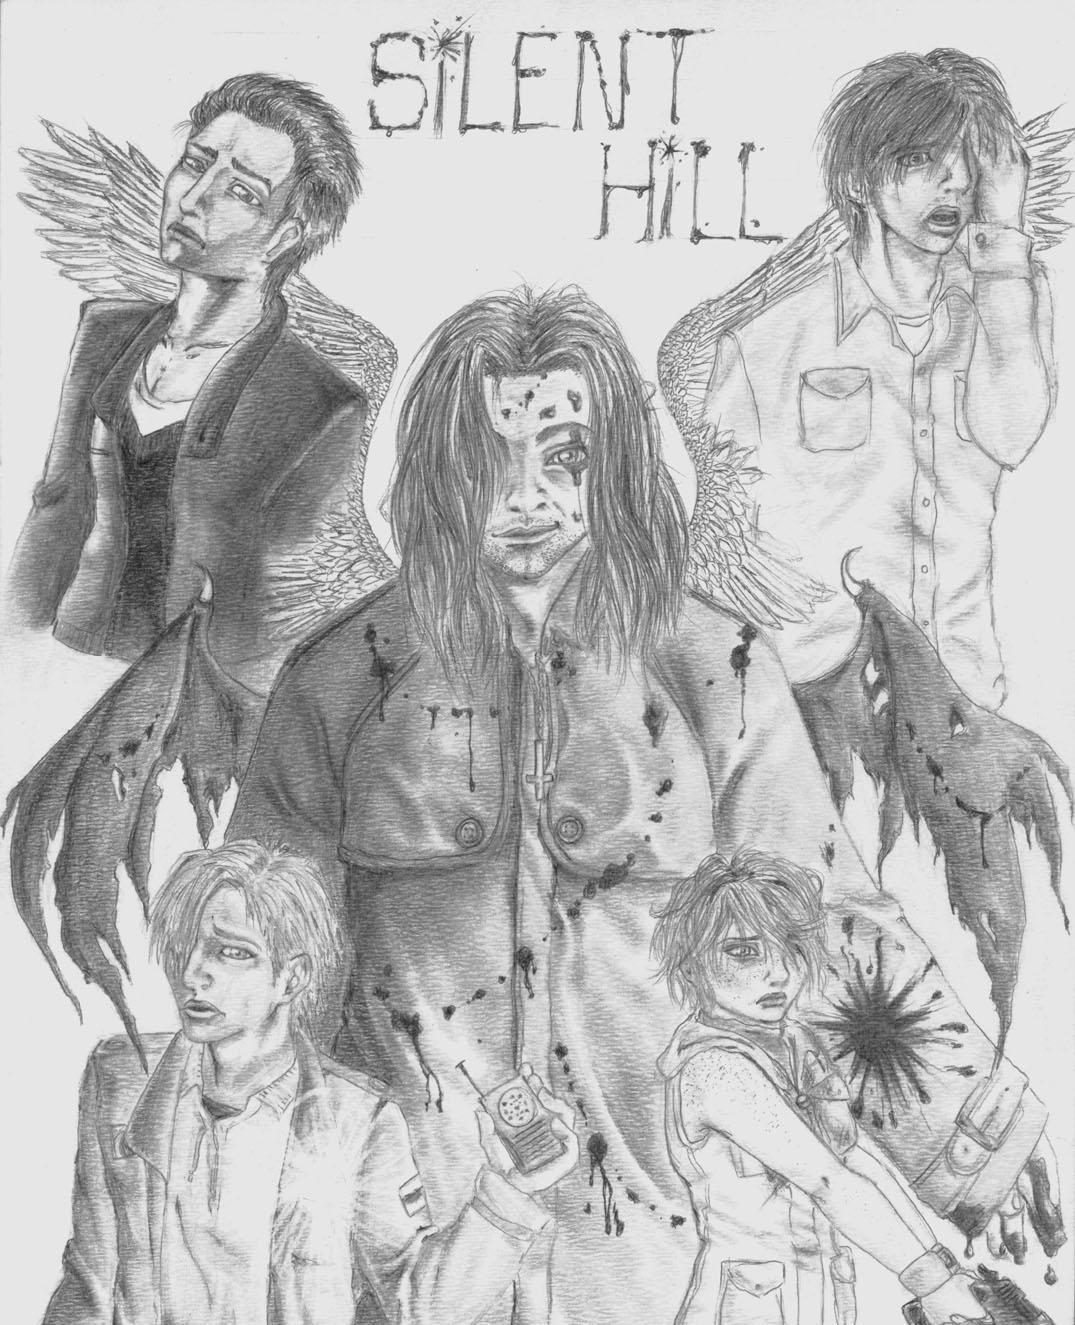 Silent Hill Poster by MistressLegato